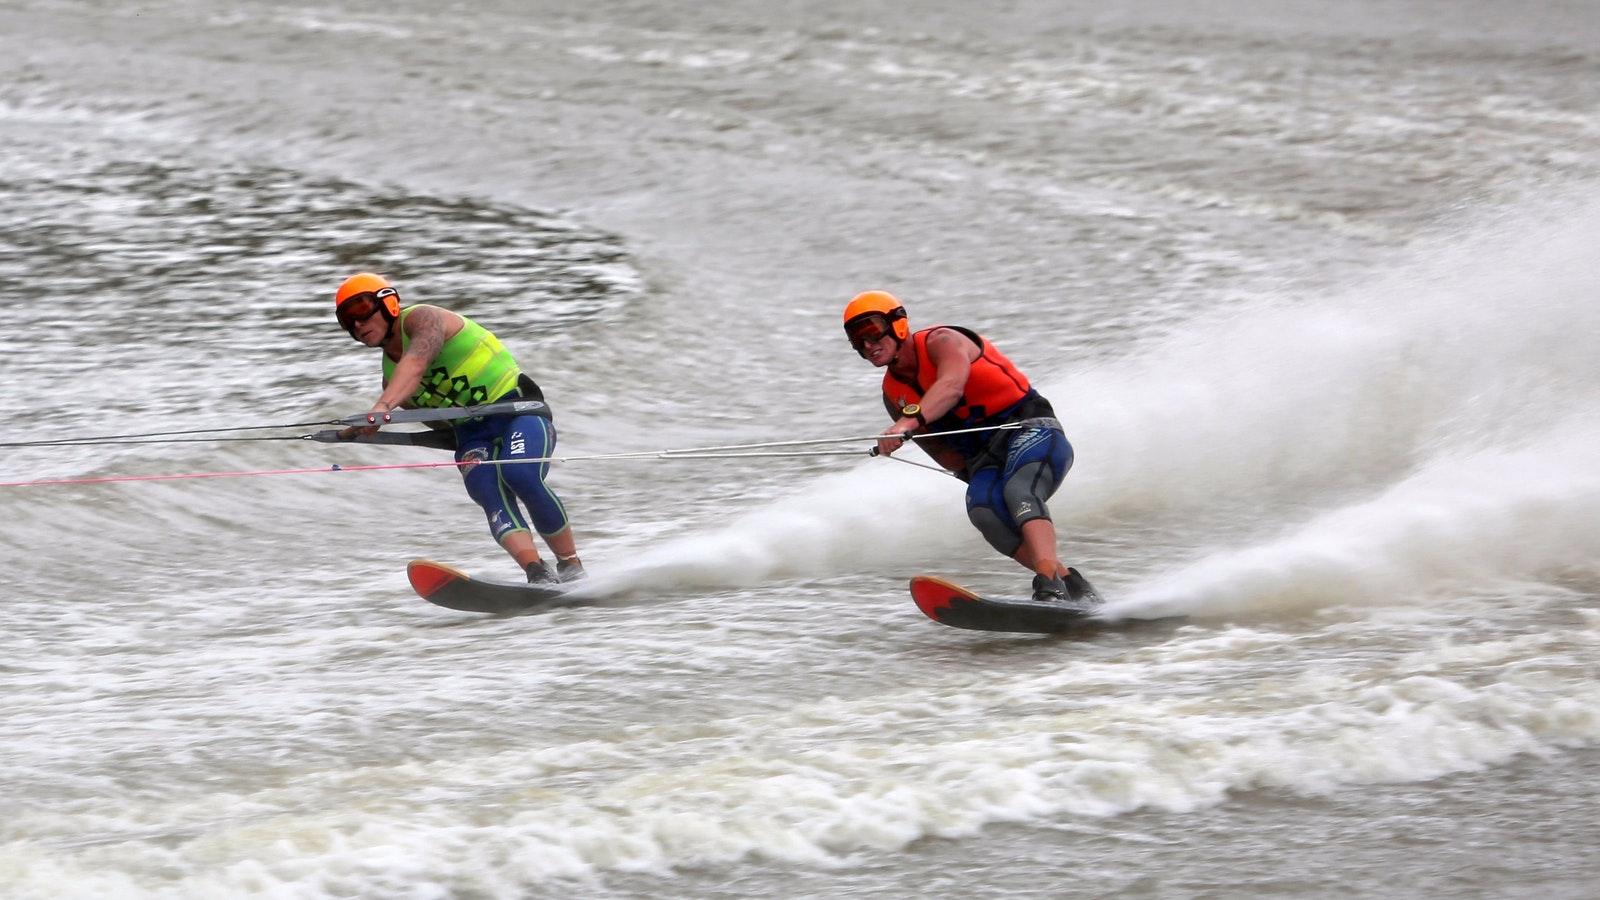 Merc Force Skiers